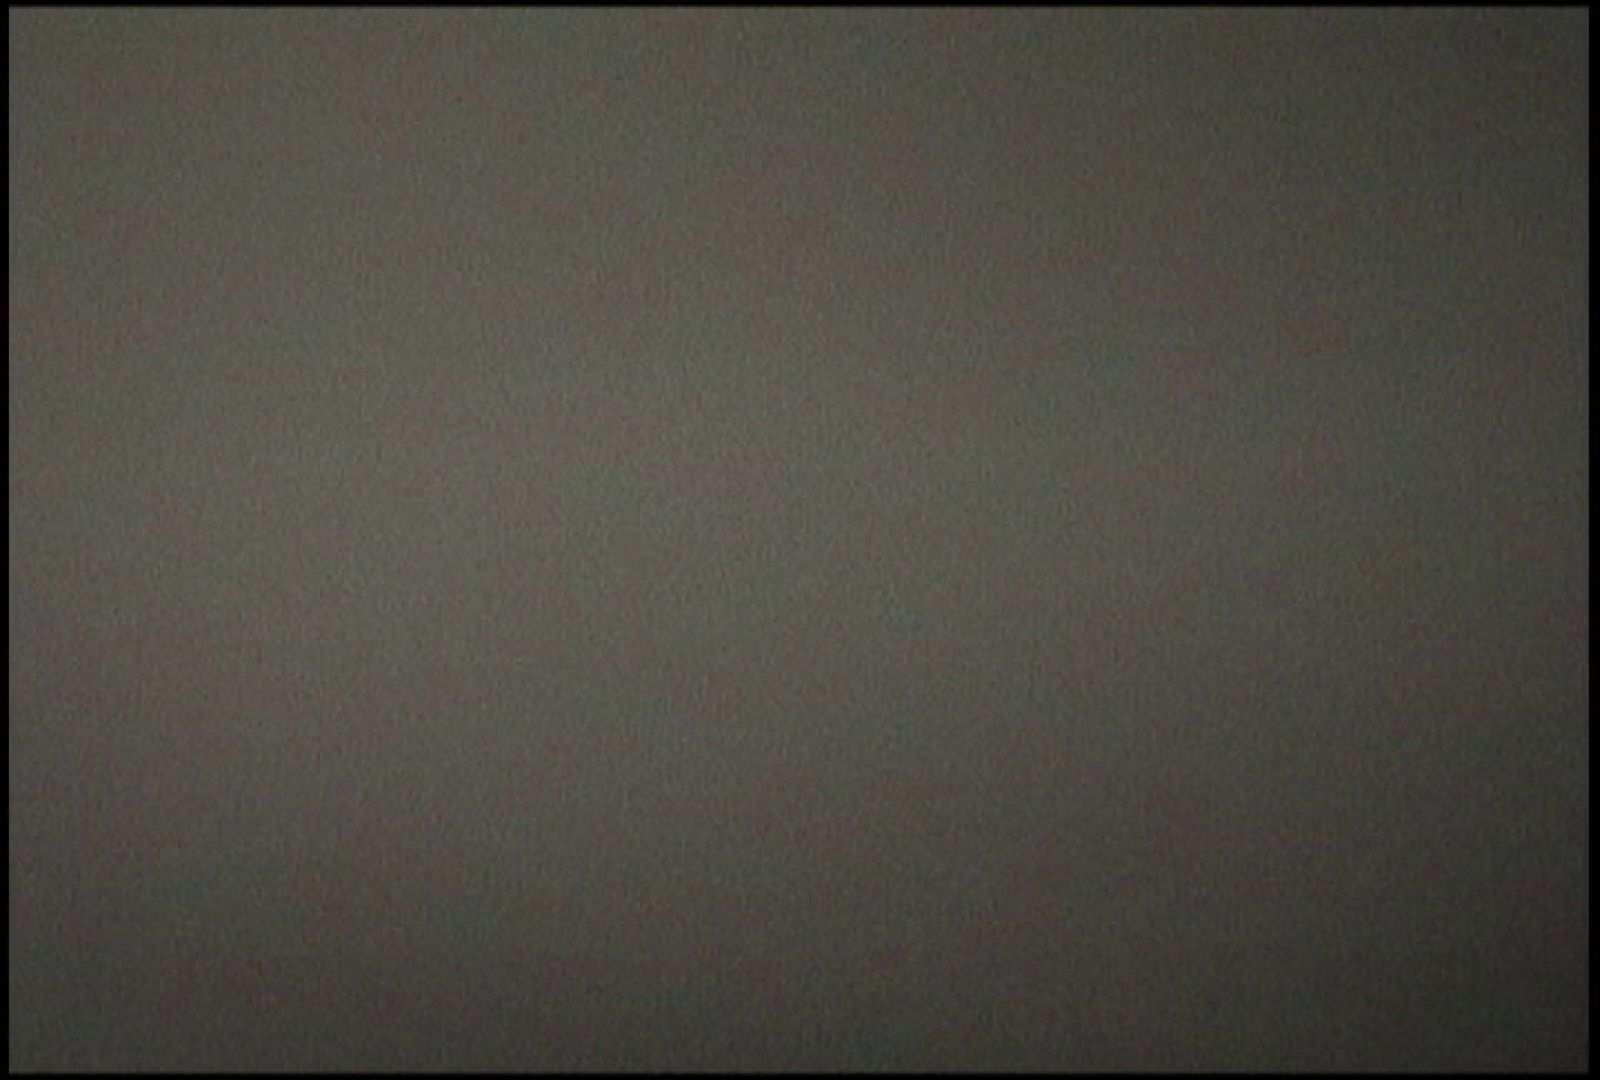 No.144 女子大生風嬢のオッパイは離れています シャワー室 AV無料動画キャプチャ 74画像 3